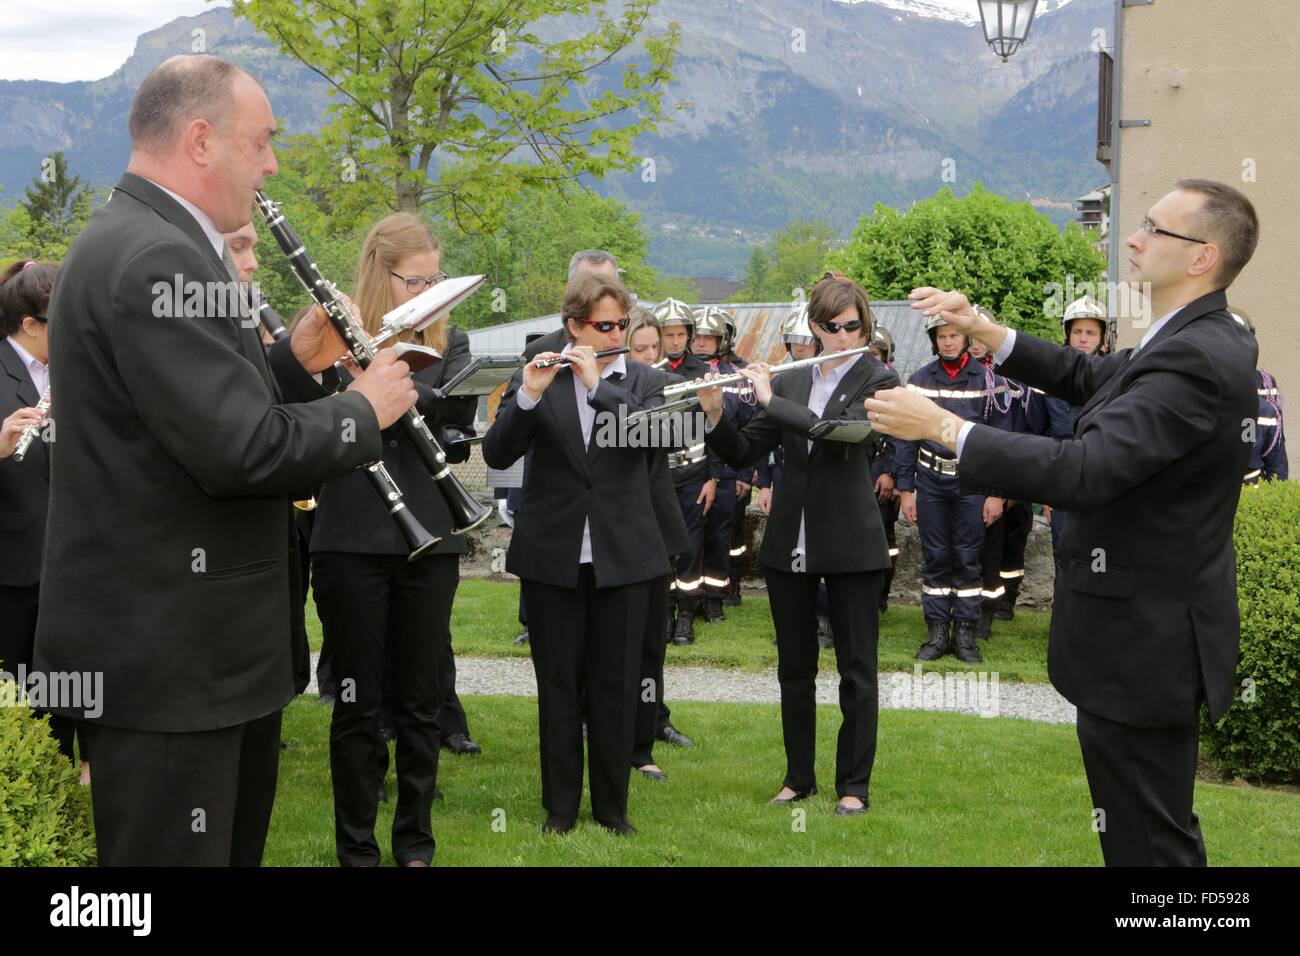 L'harmonie de St Gervais. Marching Band. Photo Stock